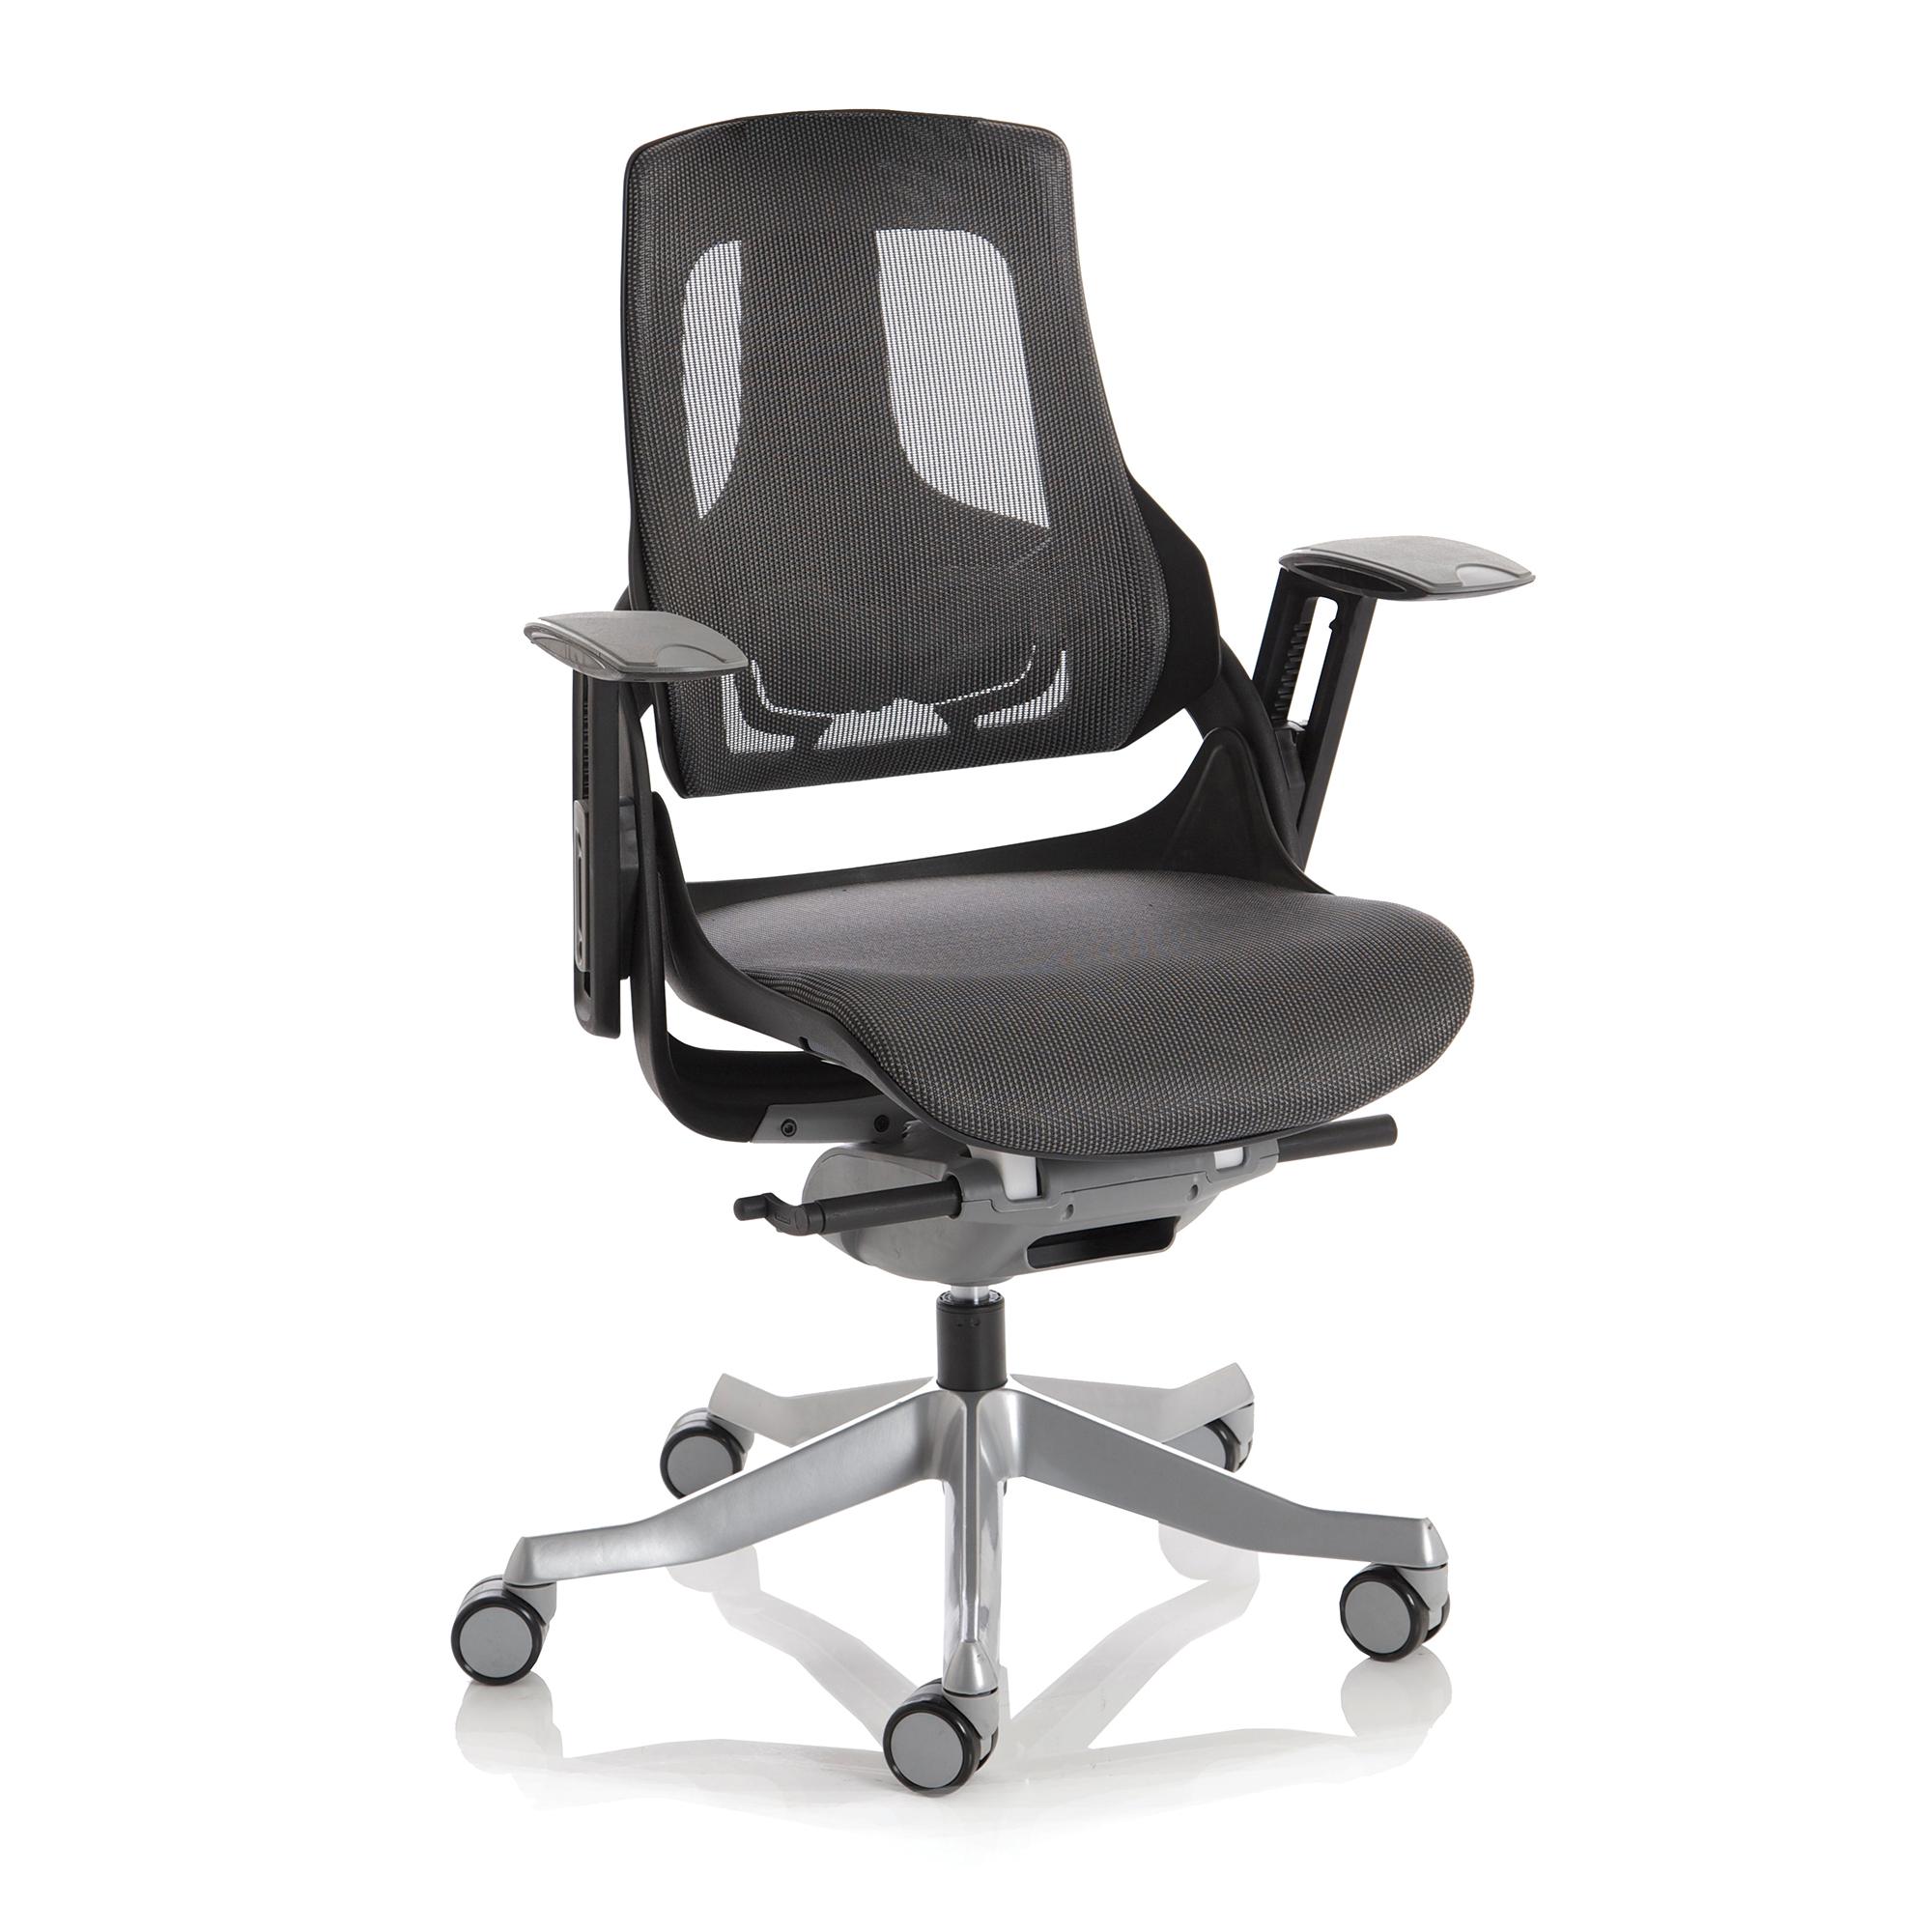 Adroit Zure Executive Chair Black Frame Mesh Charcoal Ref EX000220